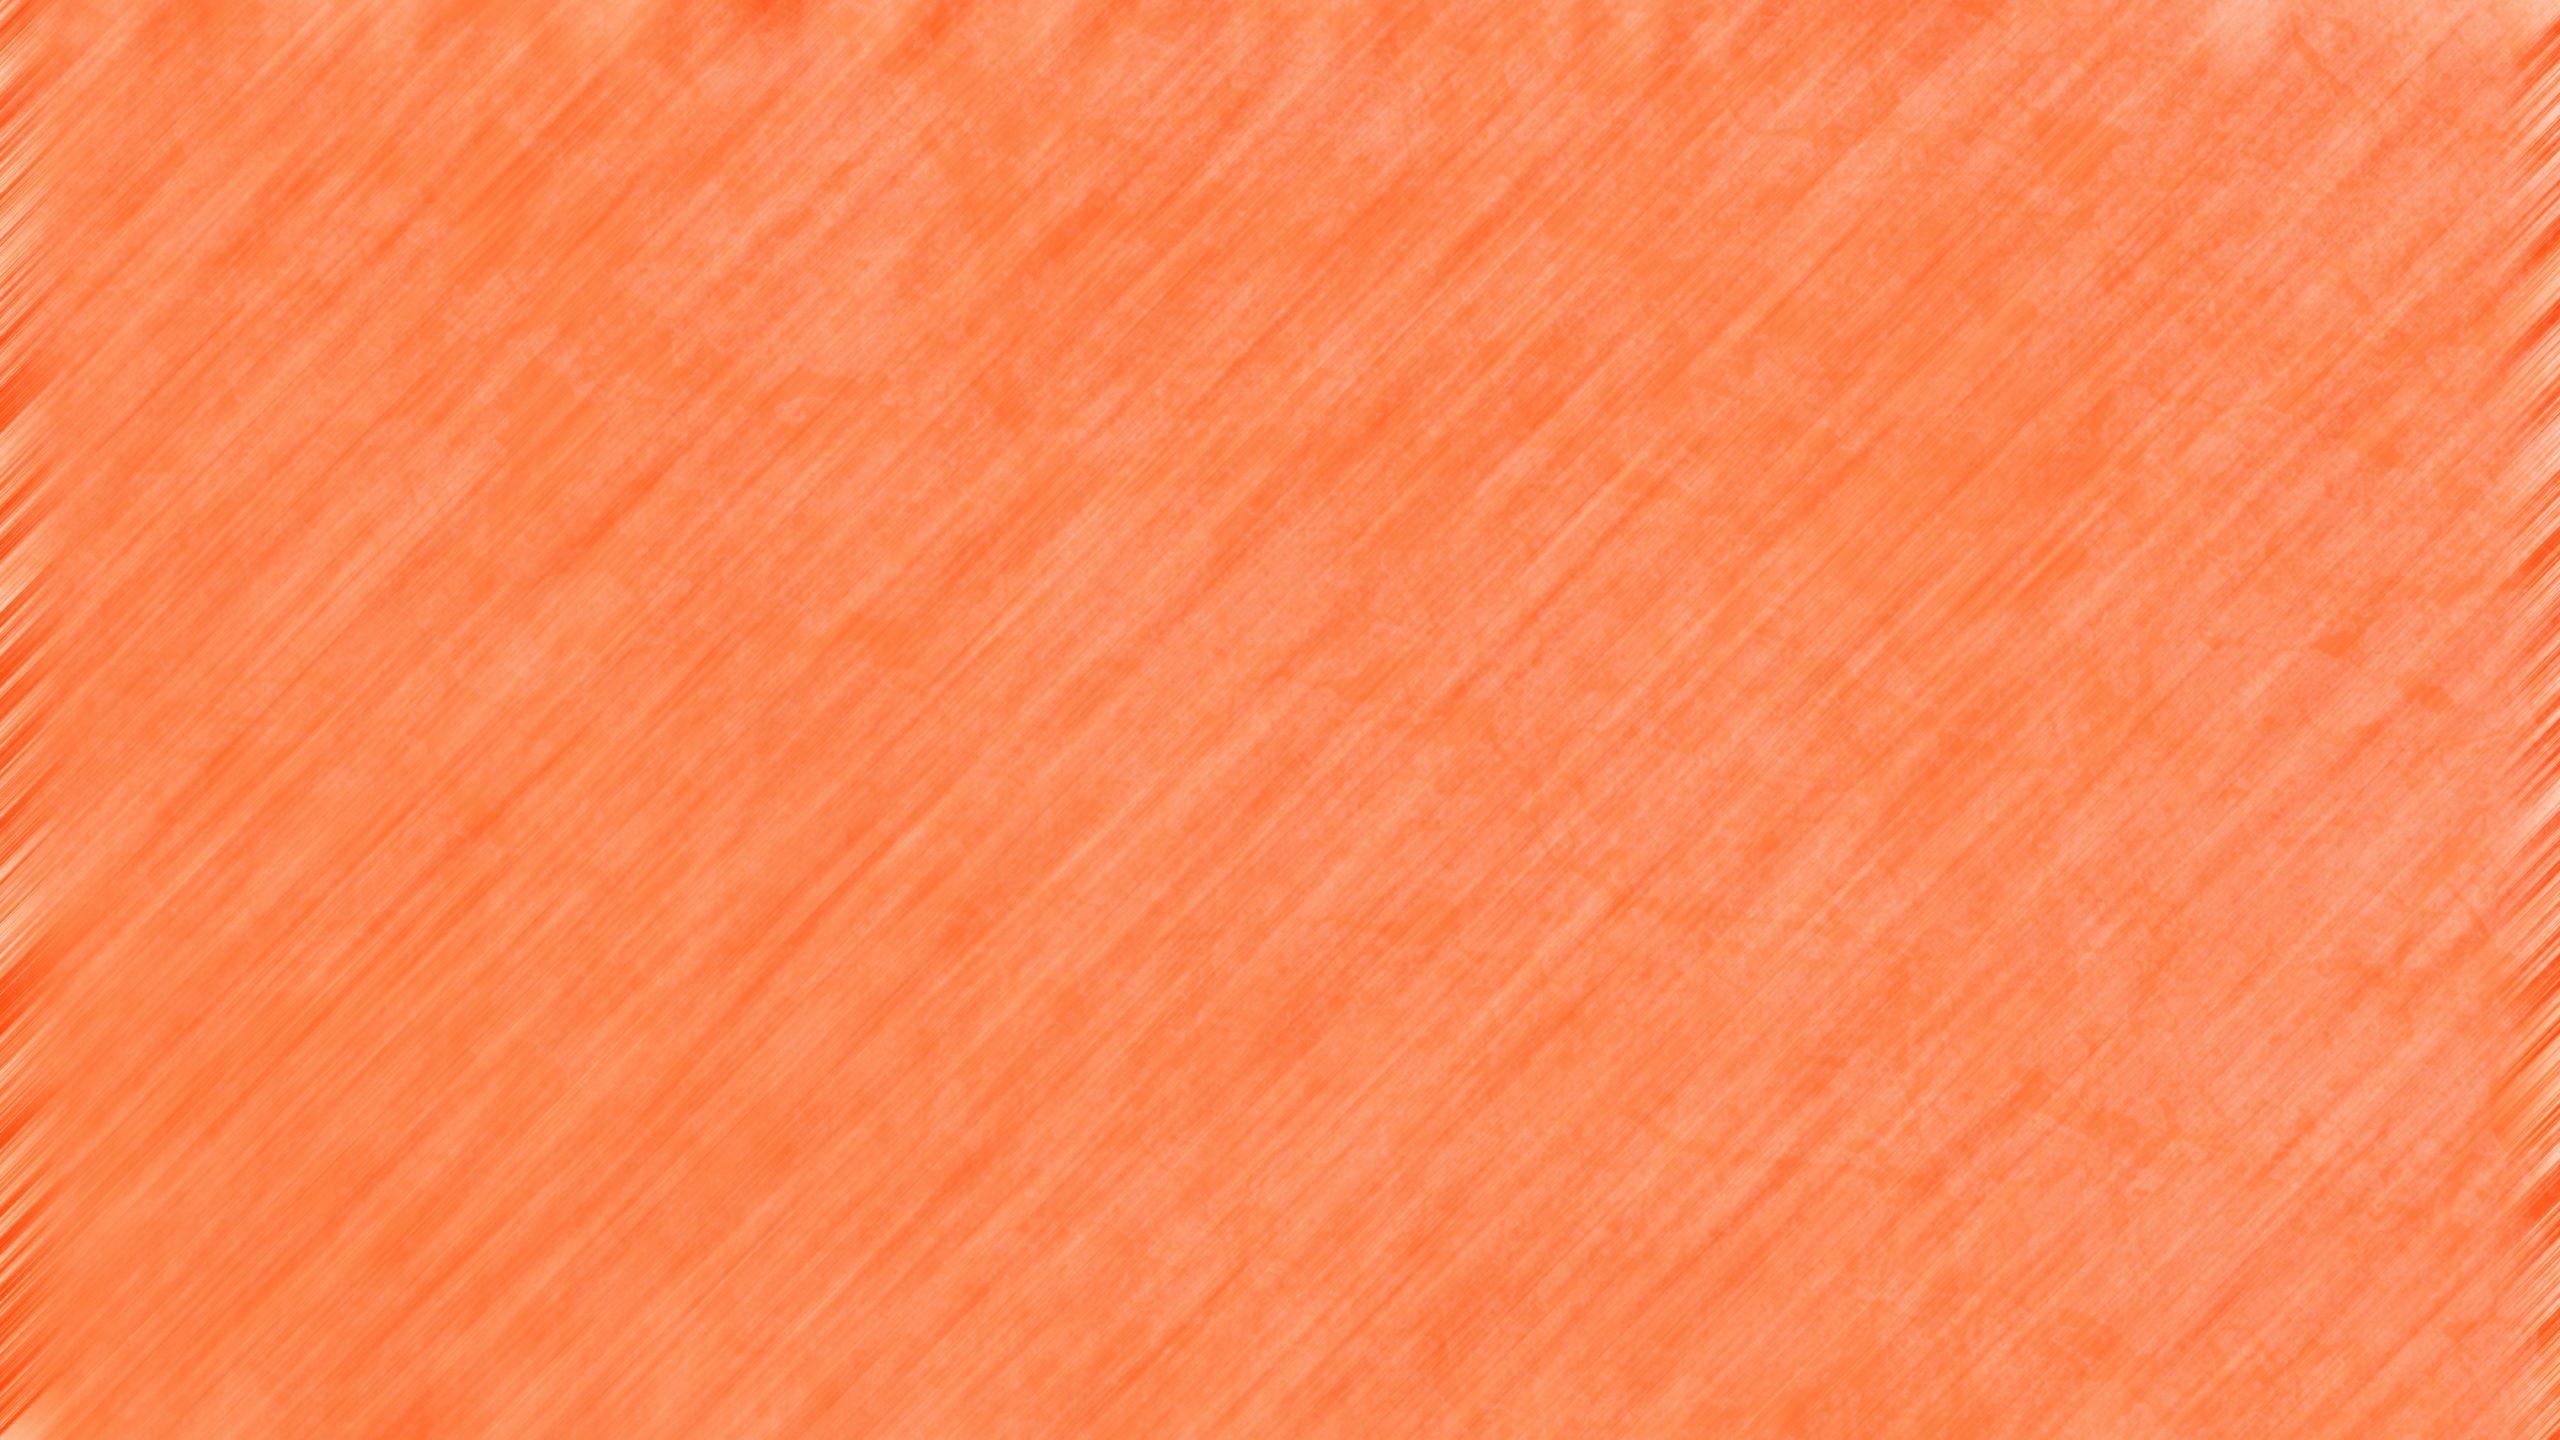 Orange pattern abstract background